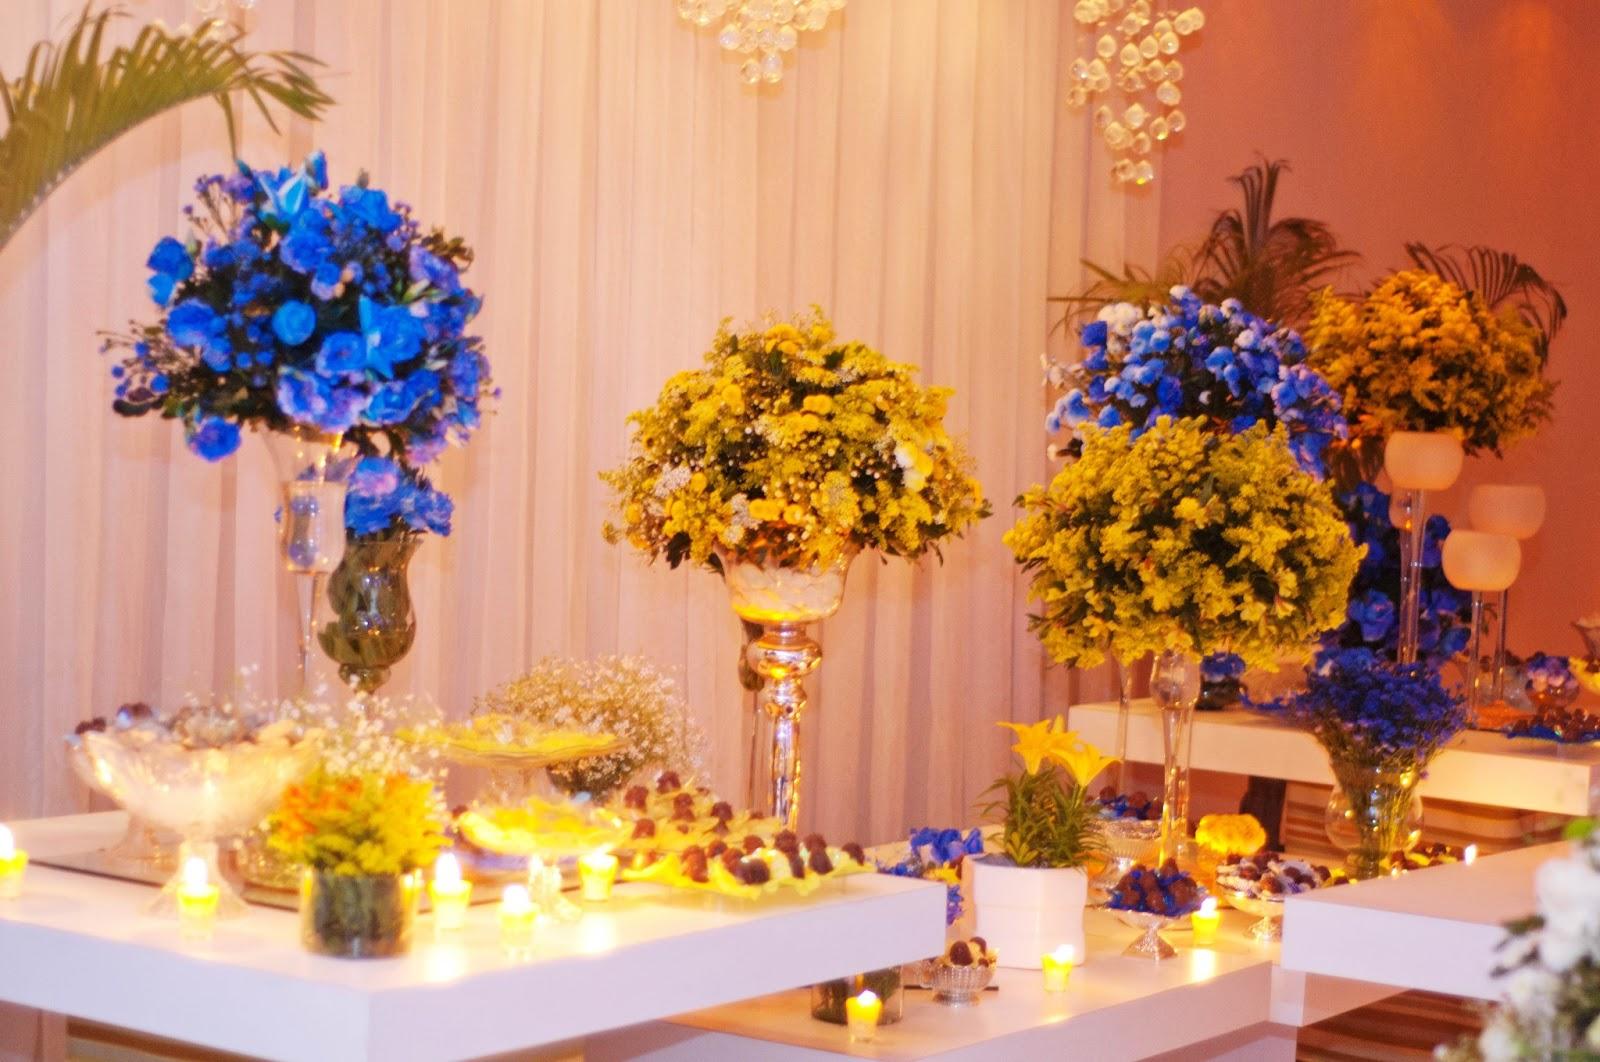 decoracao casamento rustico azul e amarelo:Decor+casamento+azul+e+amarelo+03.jpg